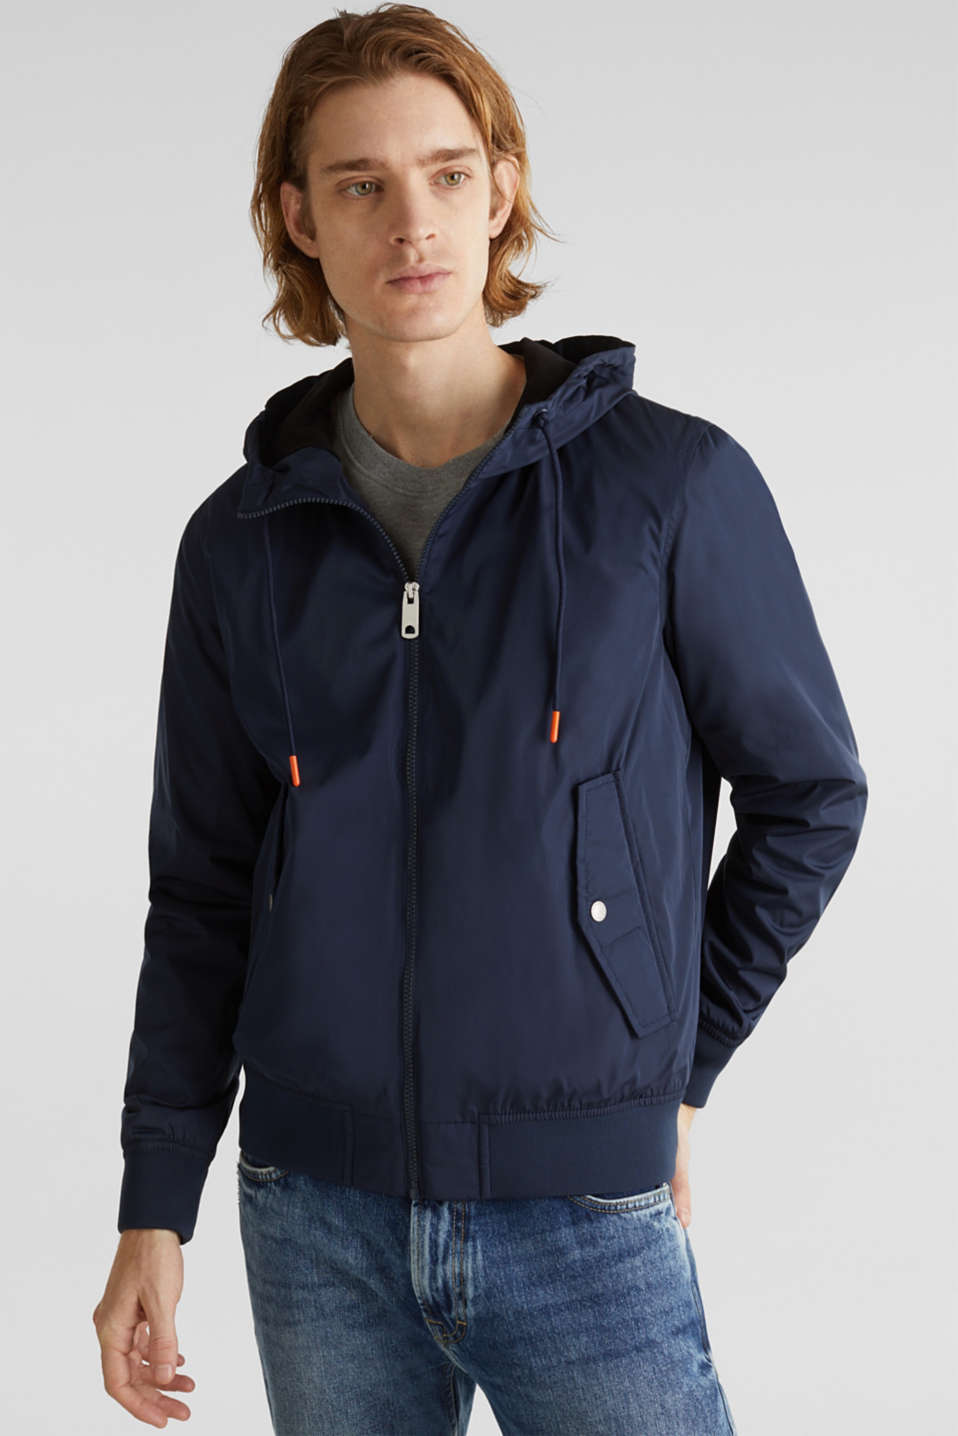 Nylon bomber jacket with a hood, DARK BLUE, detail image number 0